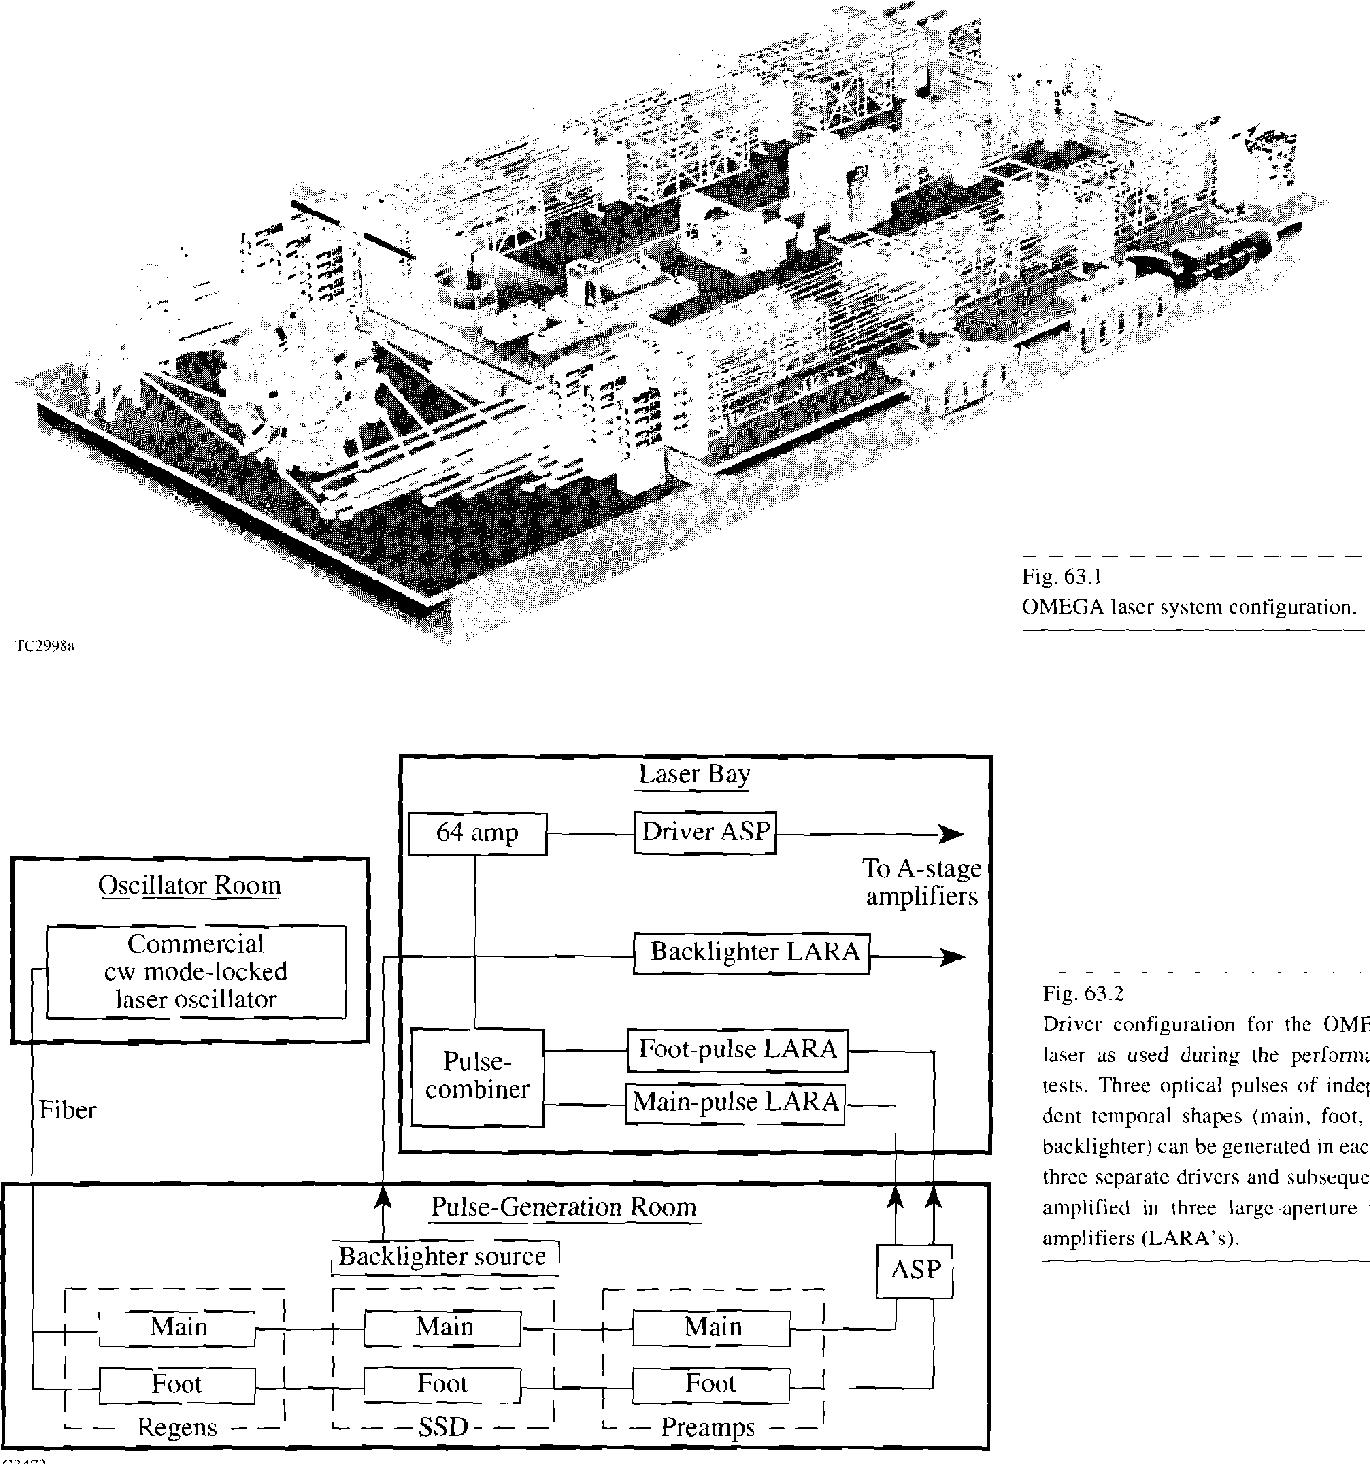 figure 63.2